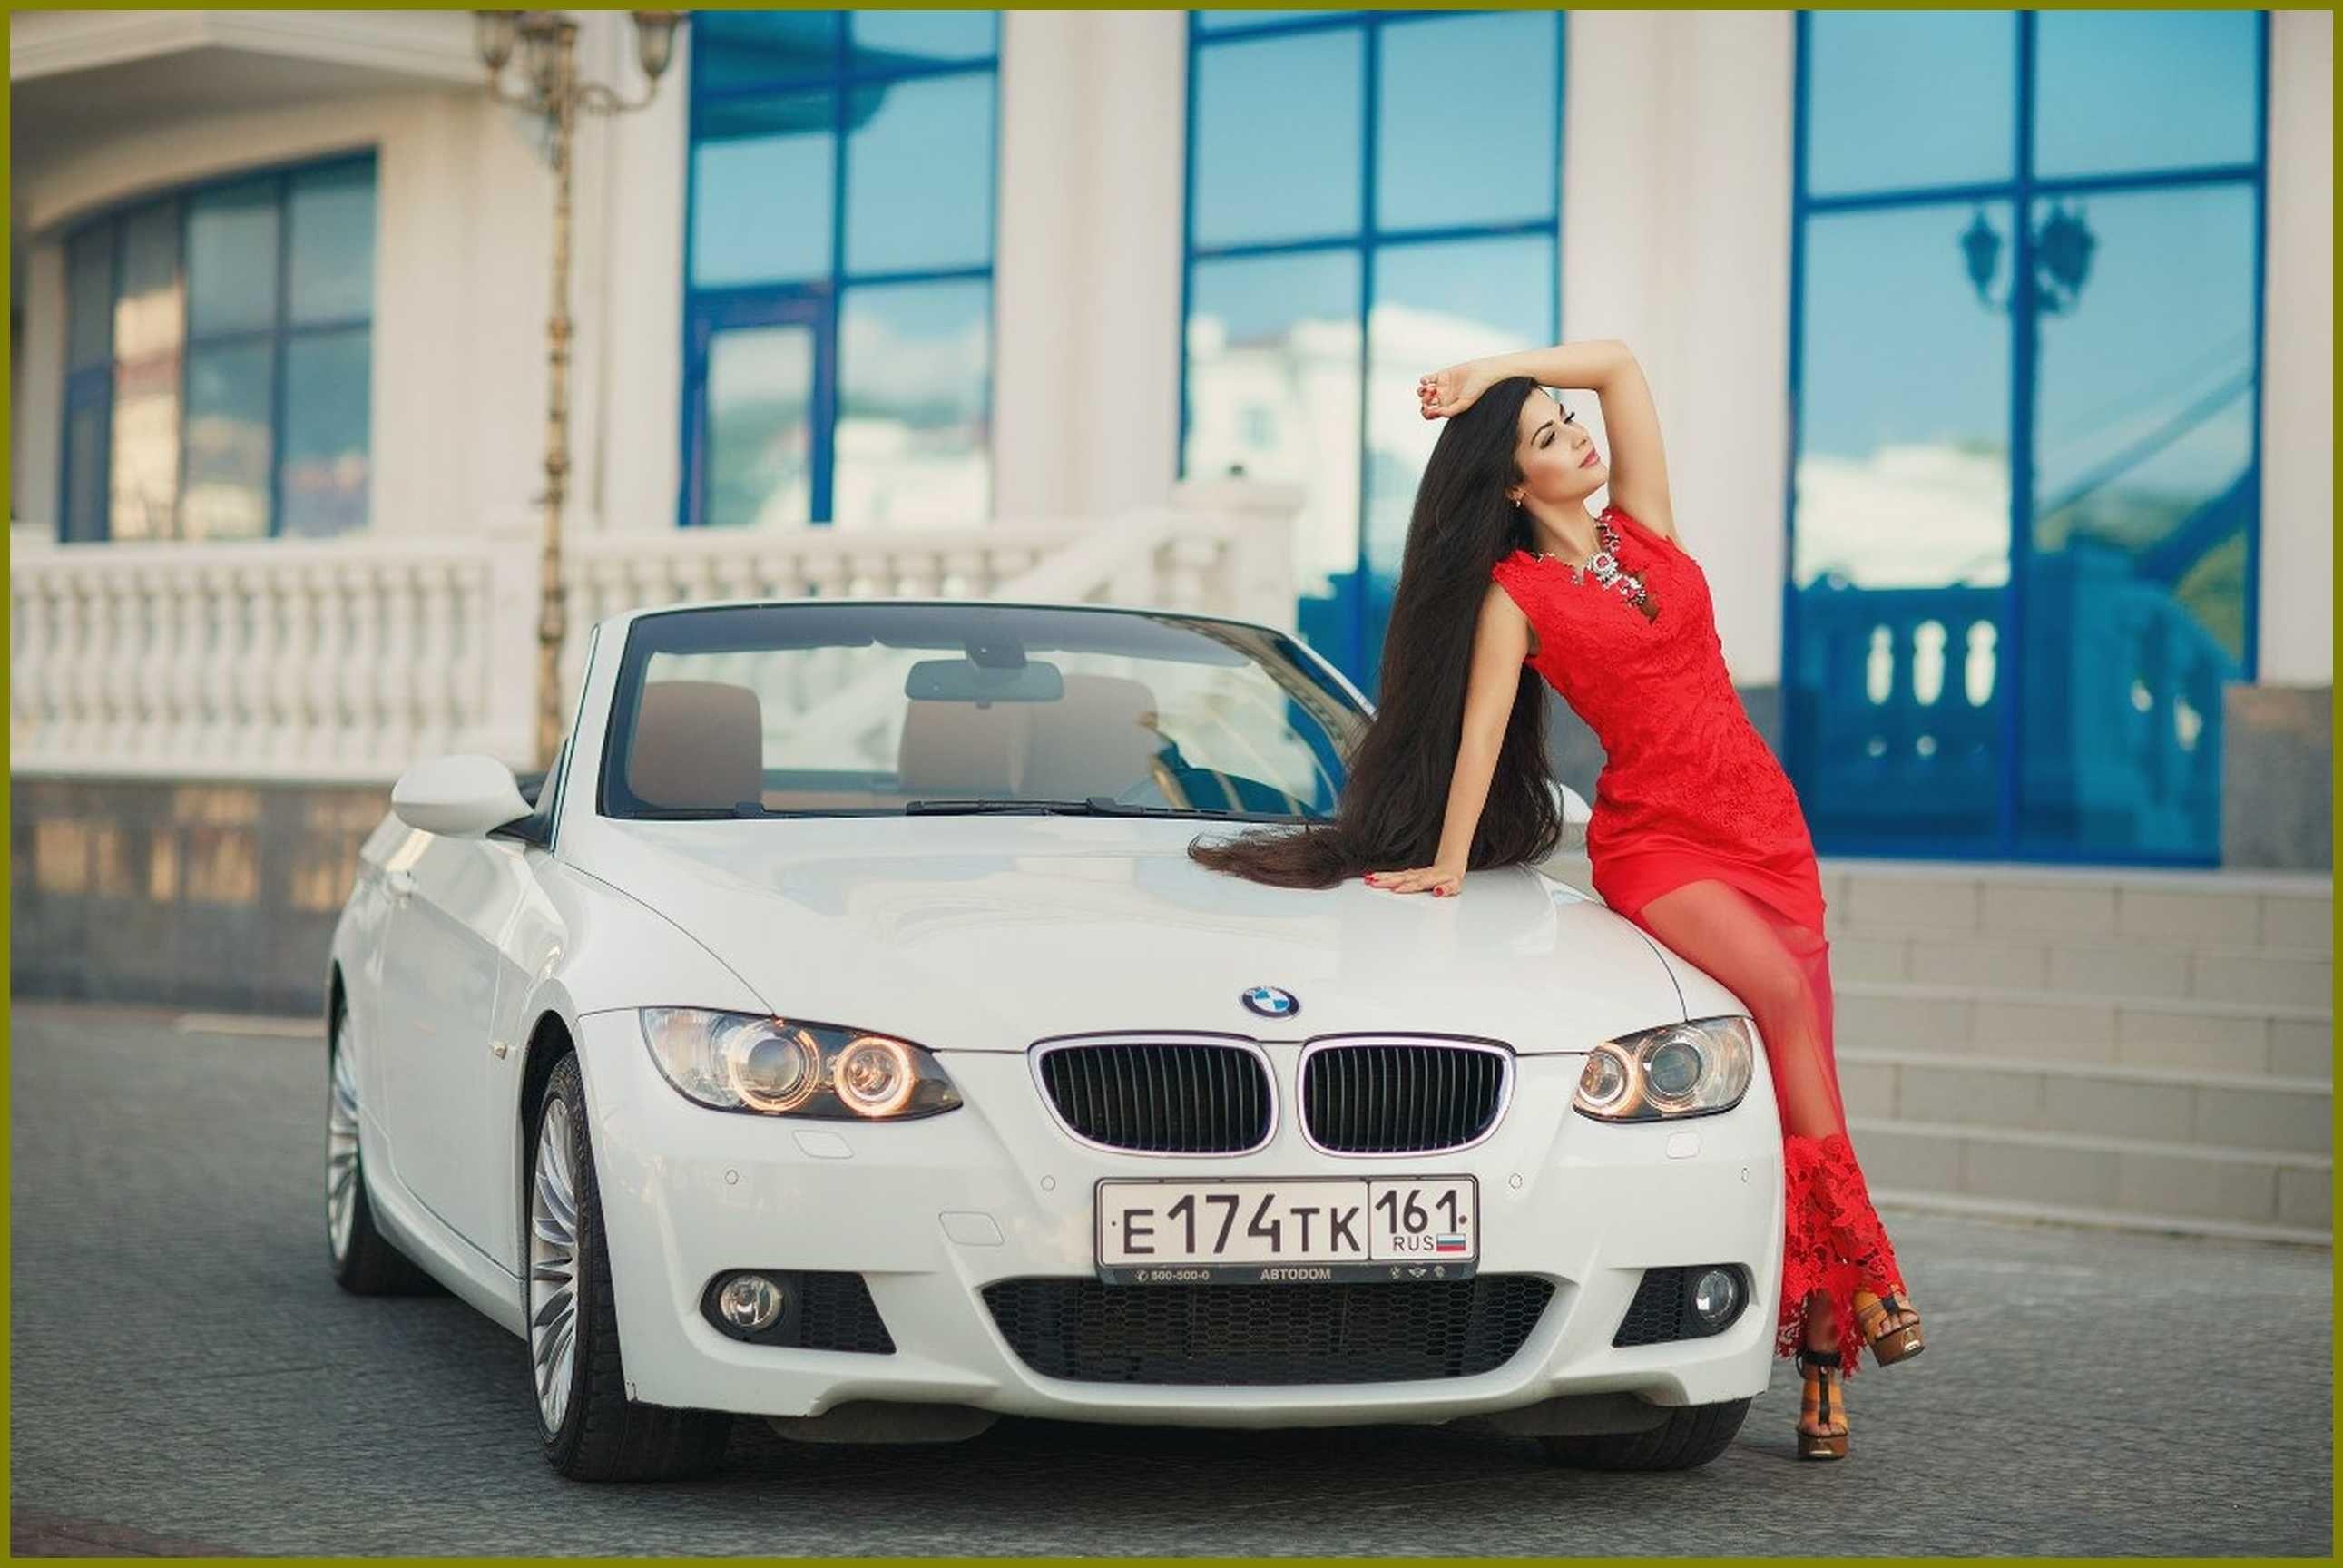 Girl Model Woman View Hair Car Bmw Wallpaper 2560x1706 484817 Clothiesly Com Bmw Bmw Girl Model